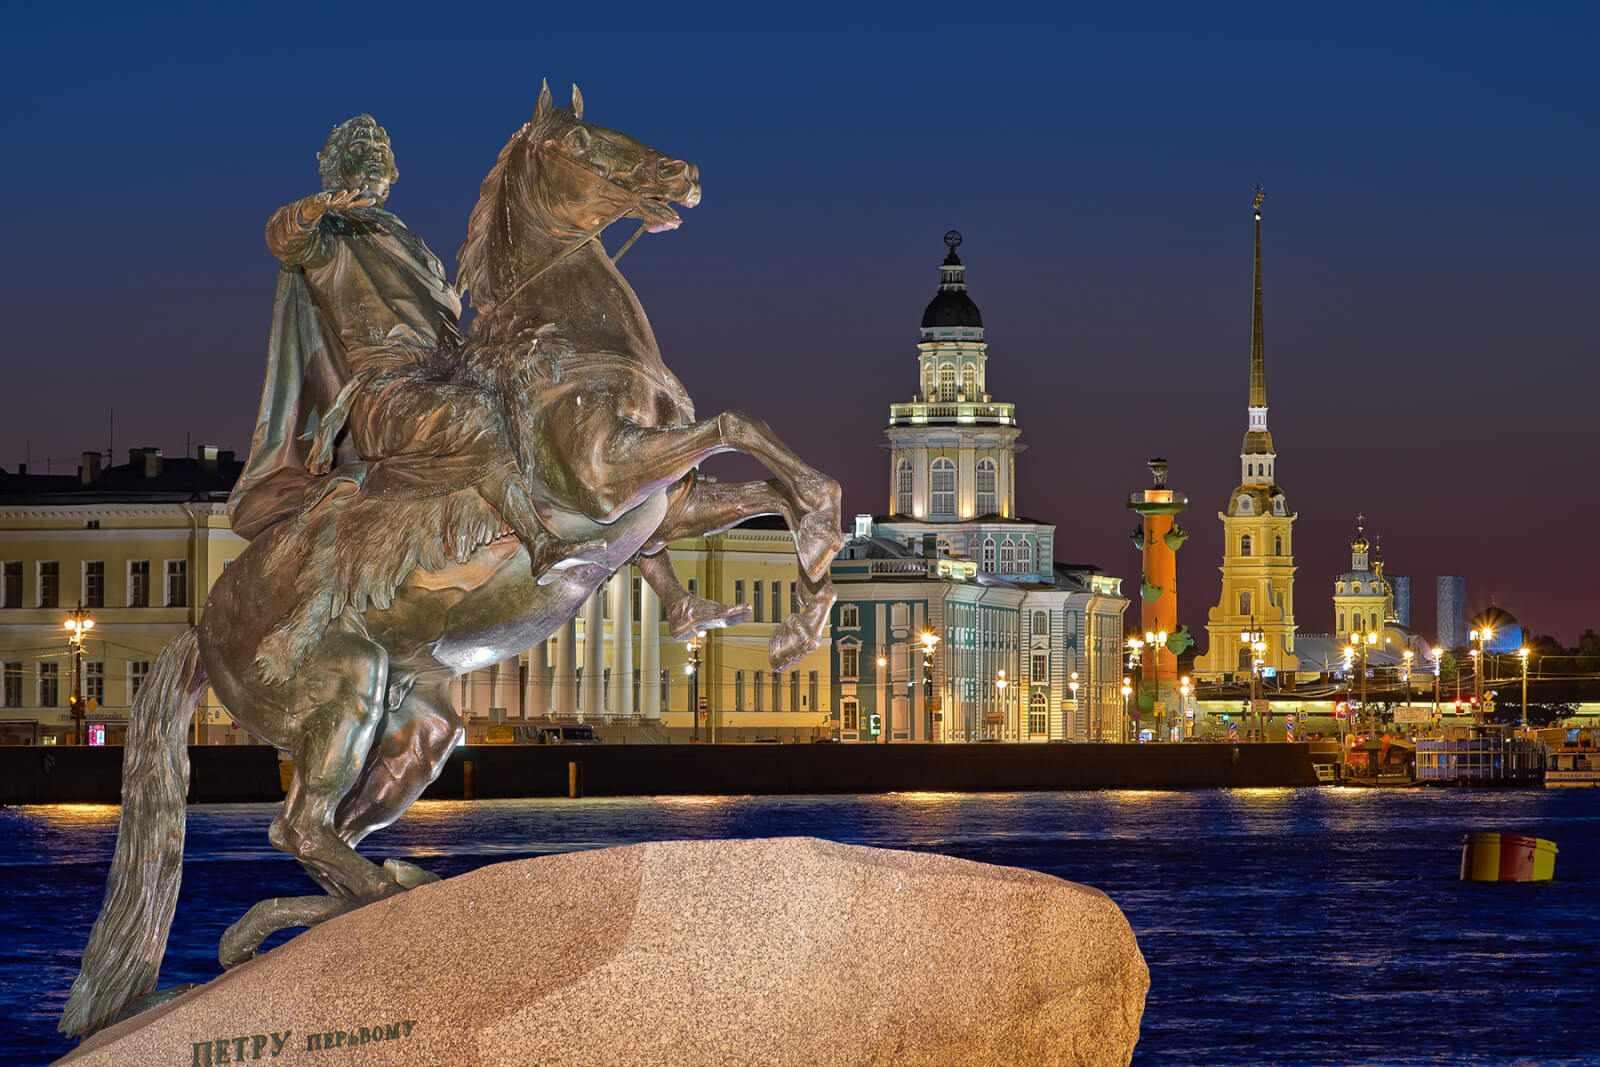 Санкт-Петербург - культурная столица